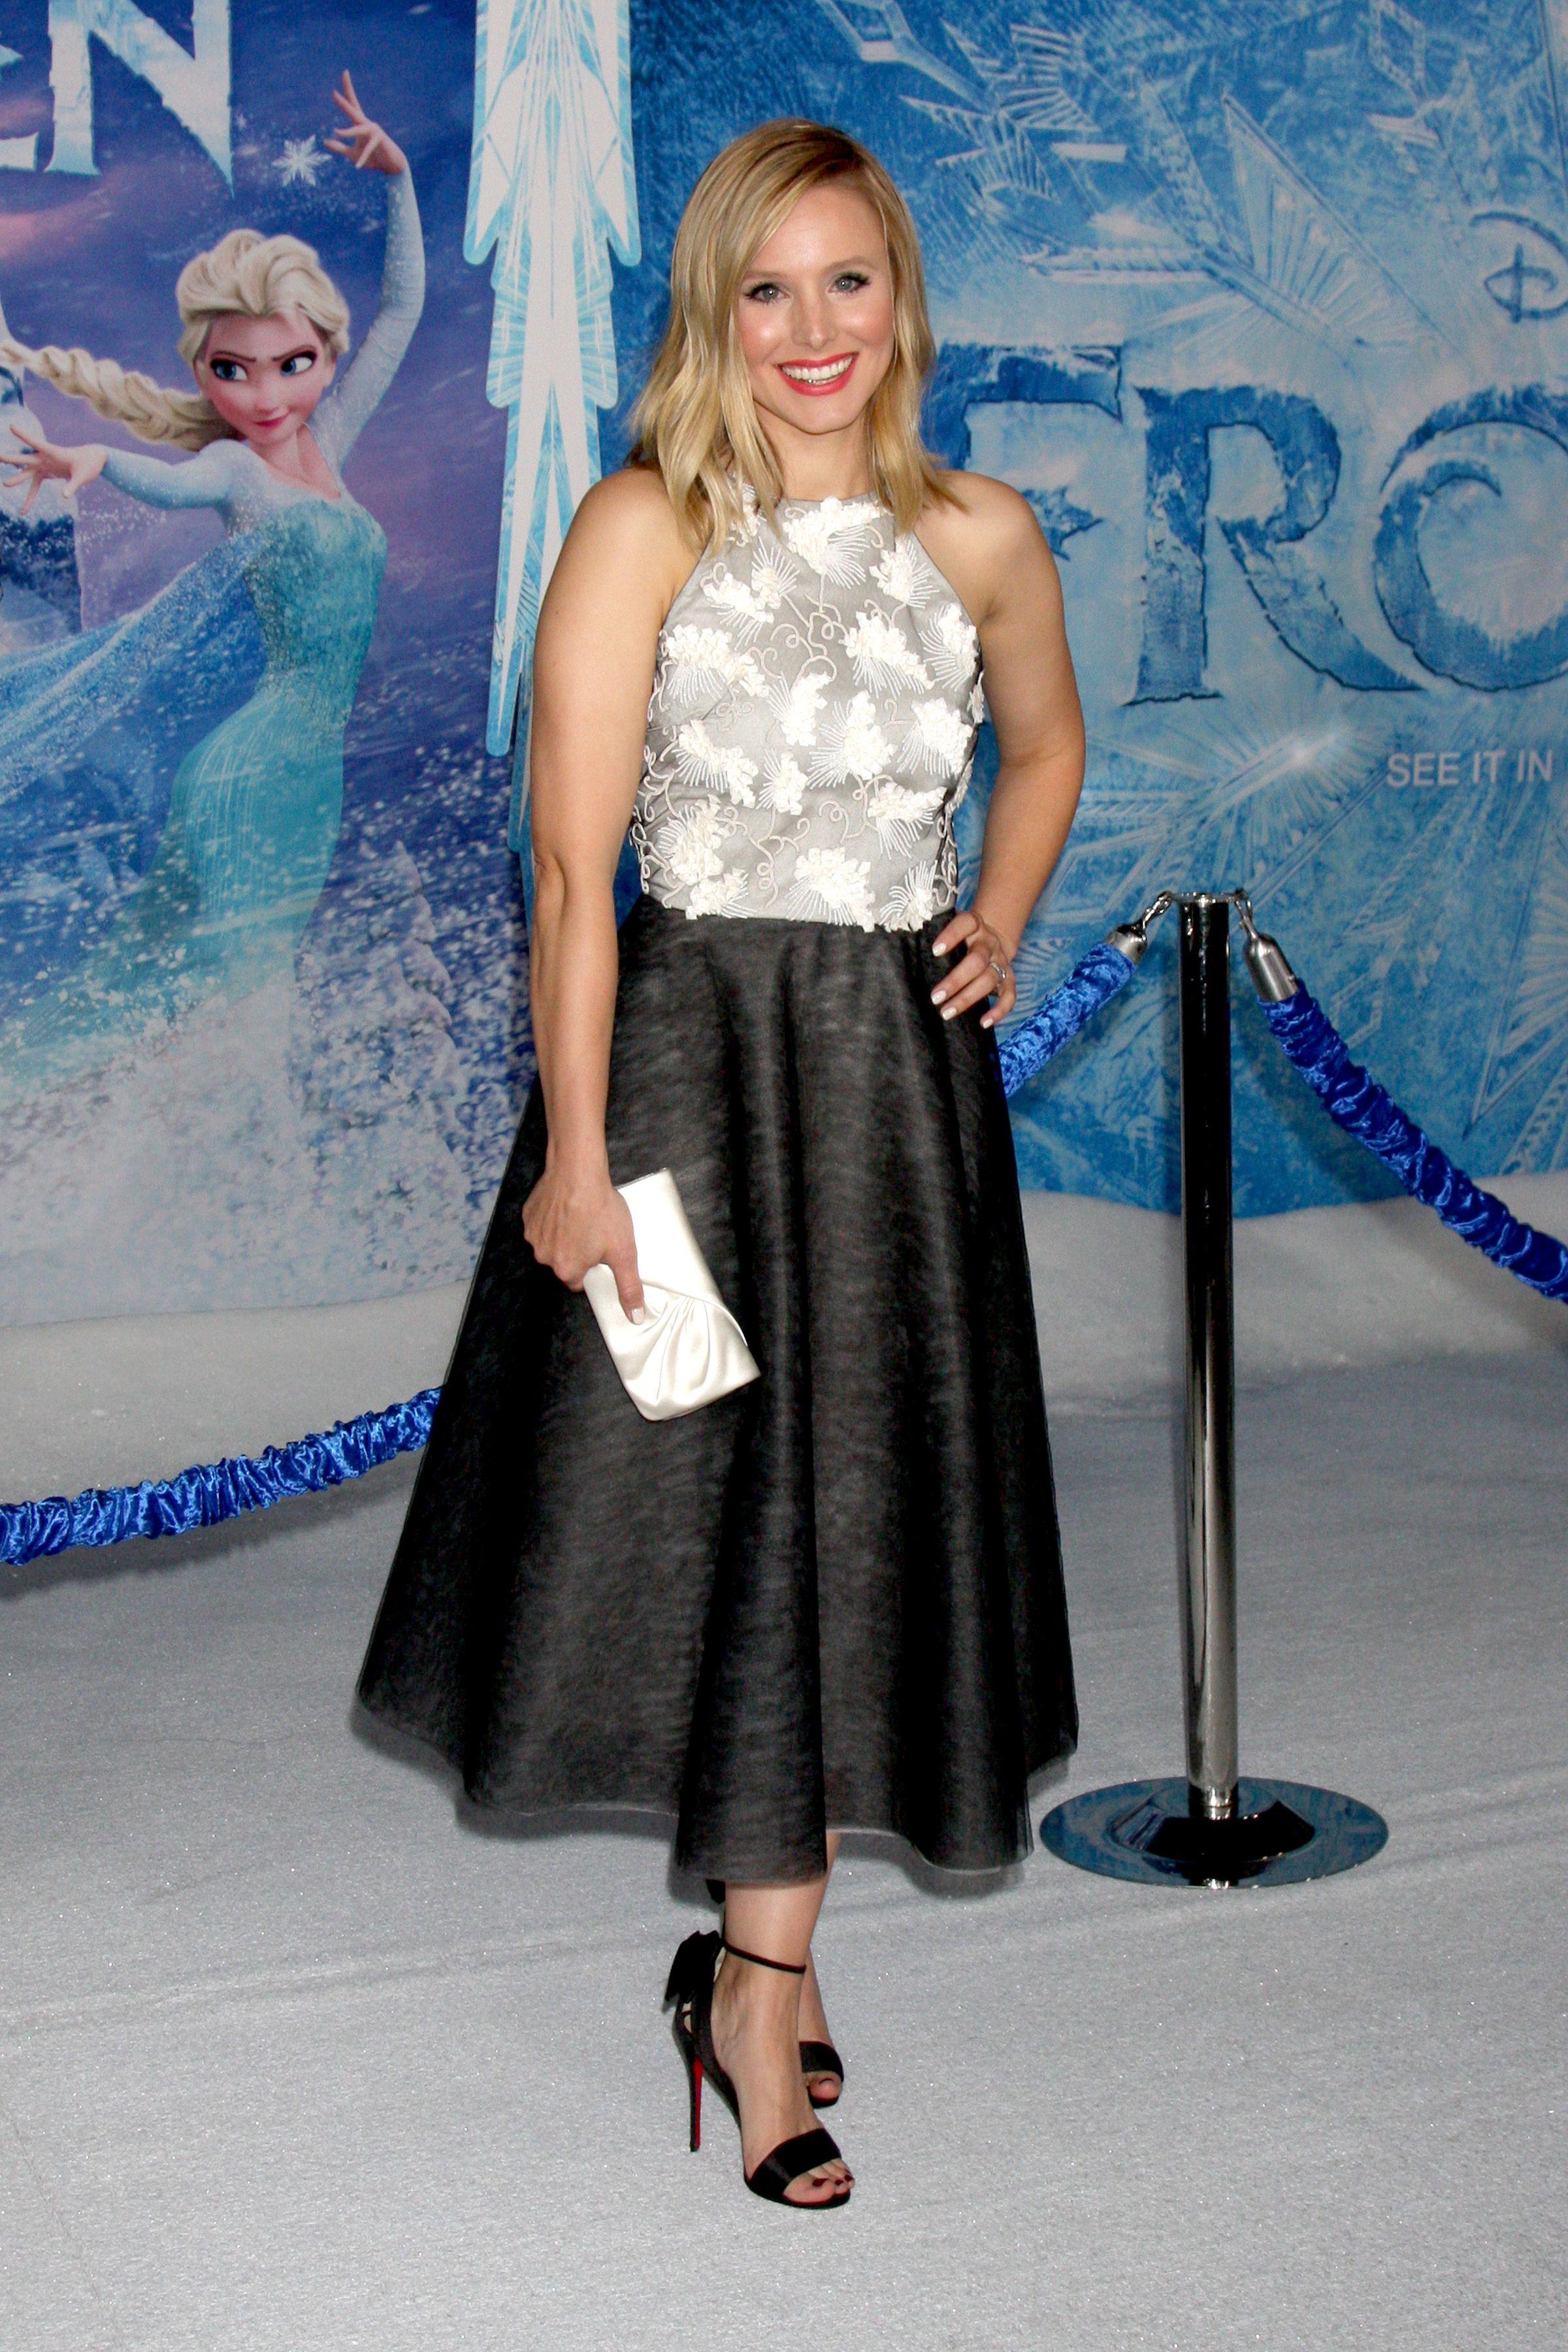 2. Kristen Bell